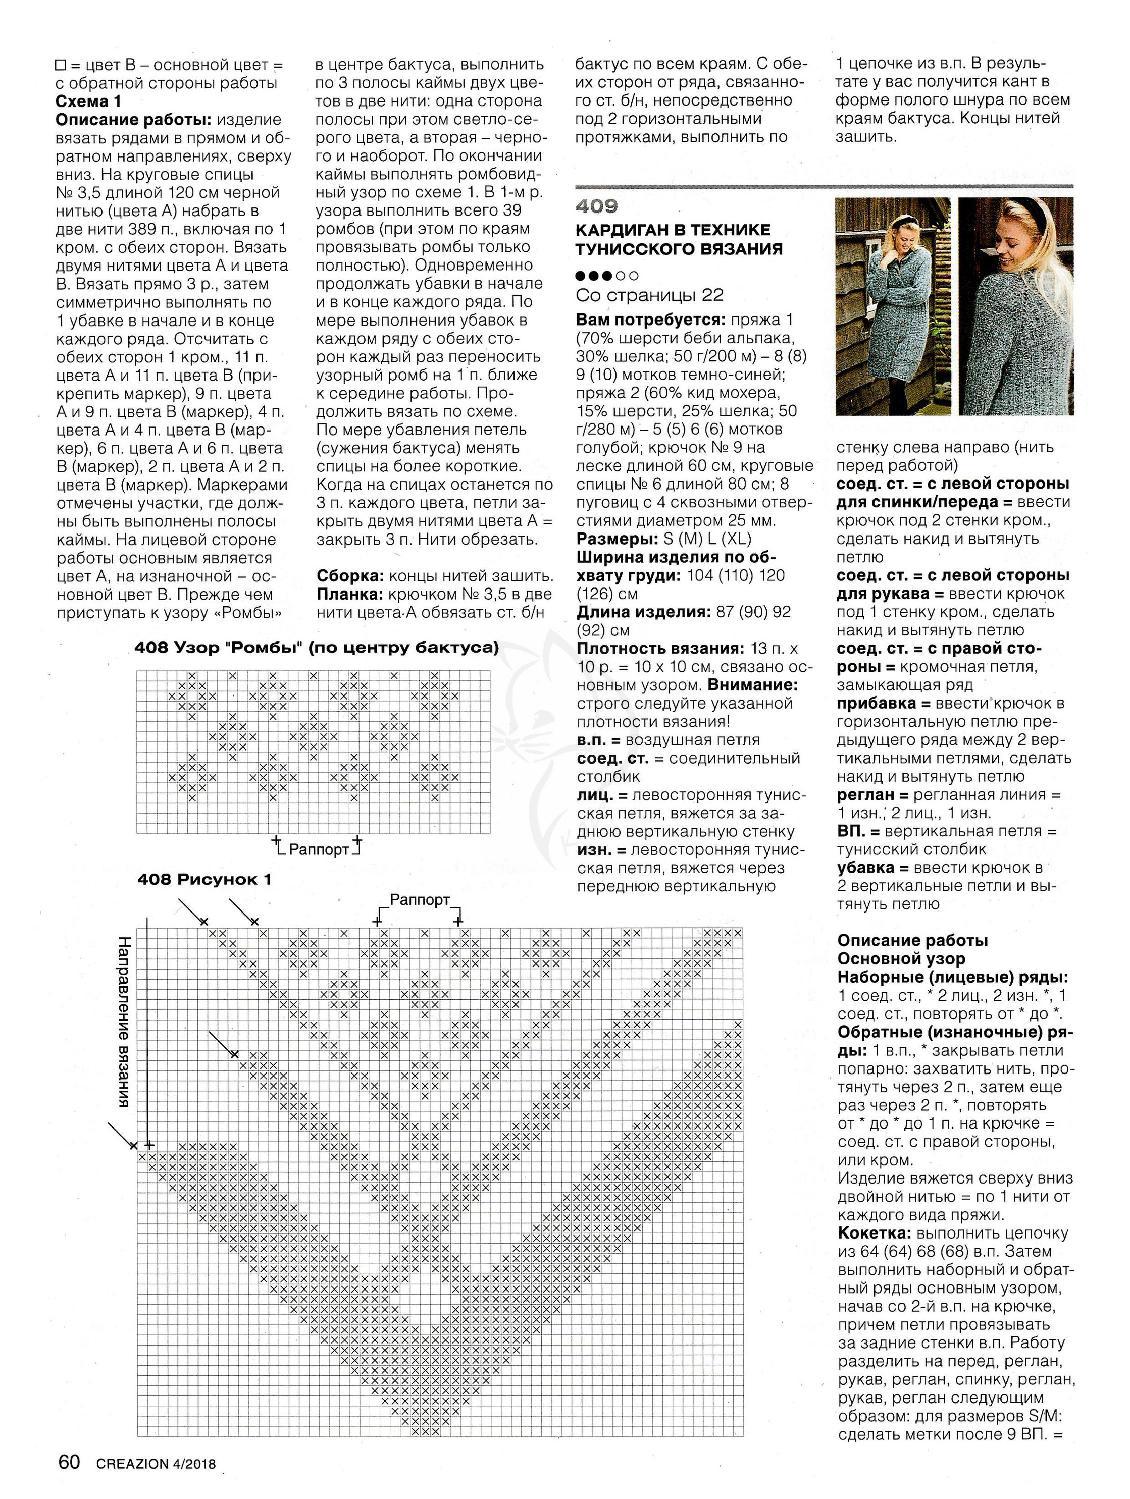 Page_00060fb003a705f687979.jpg